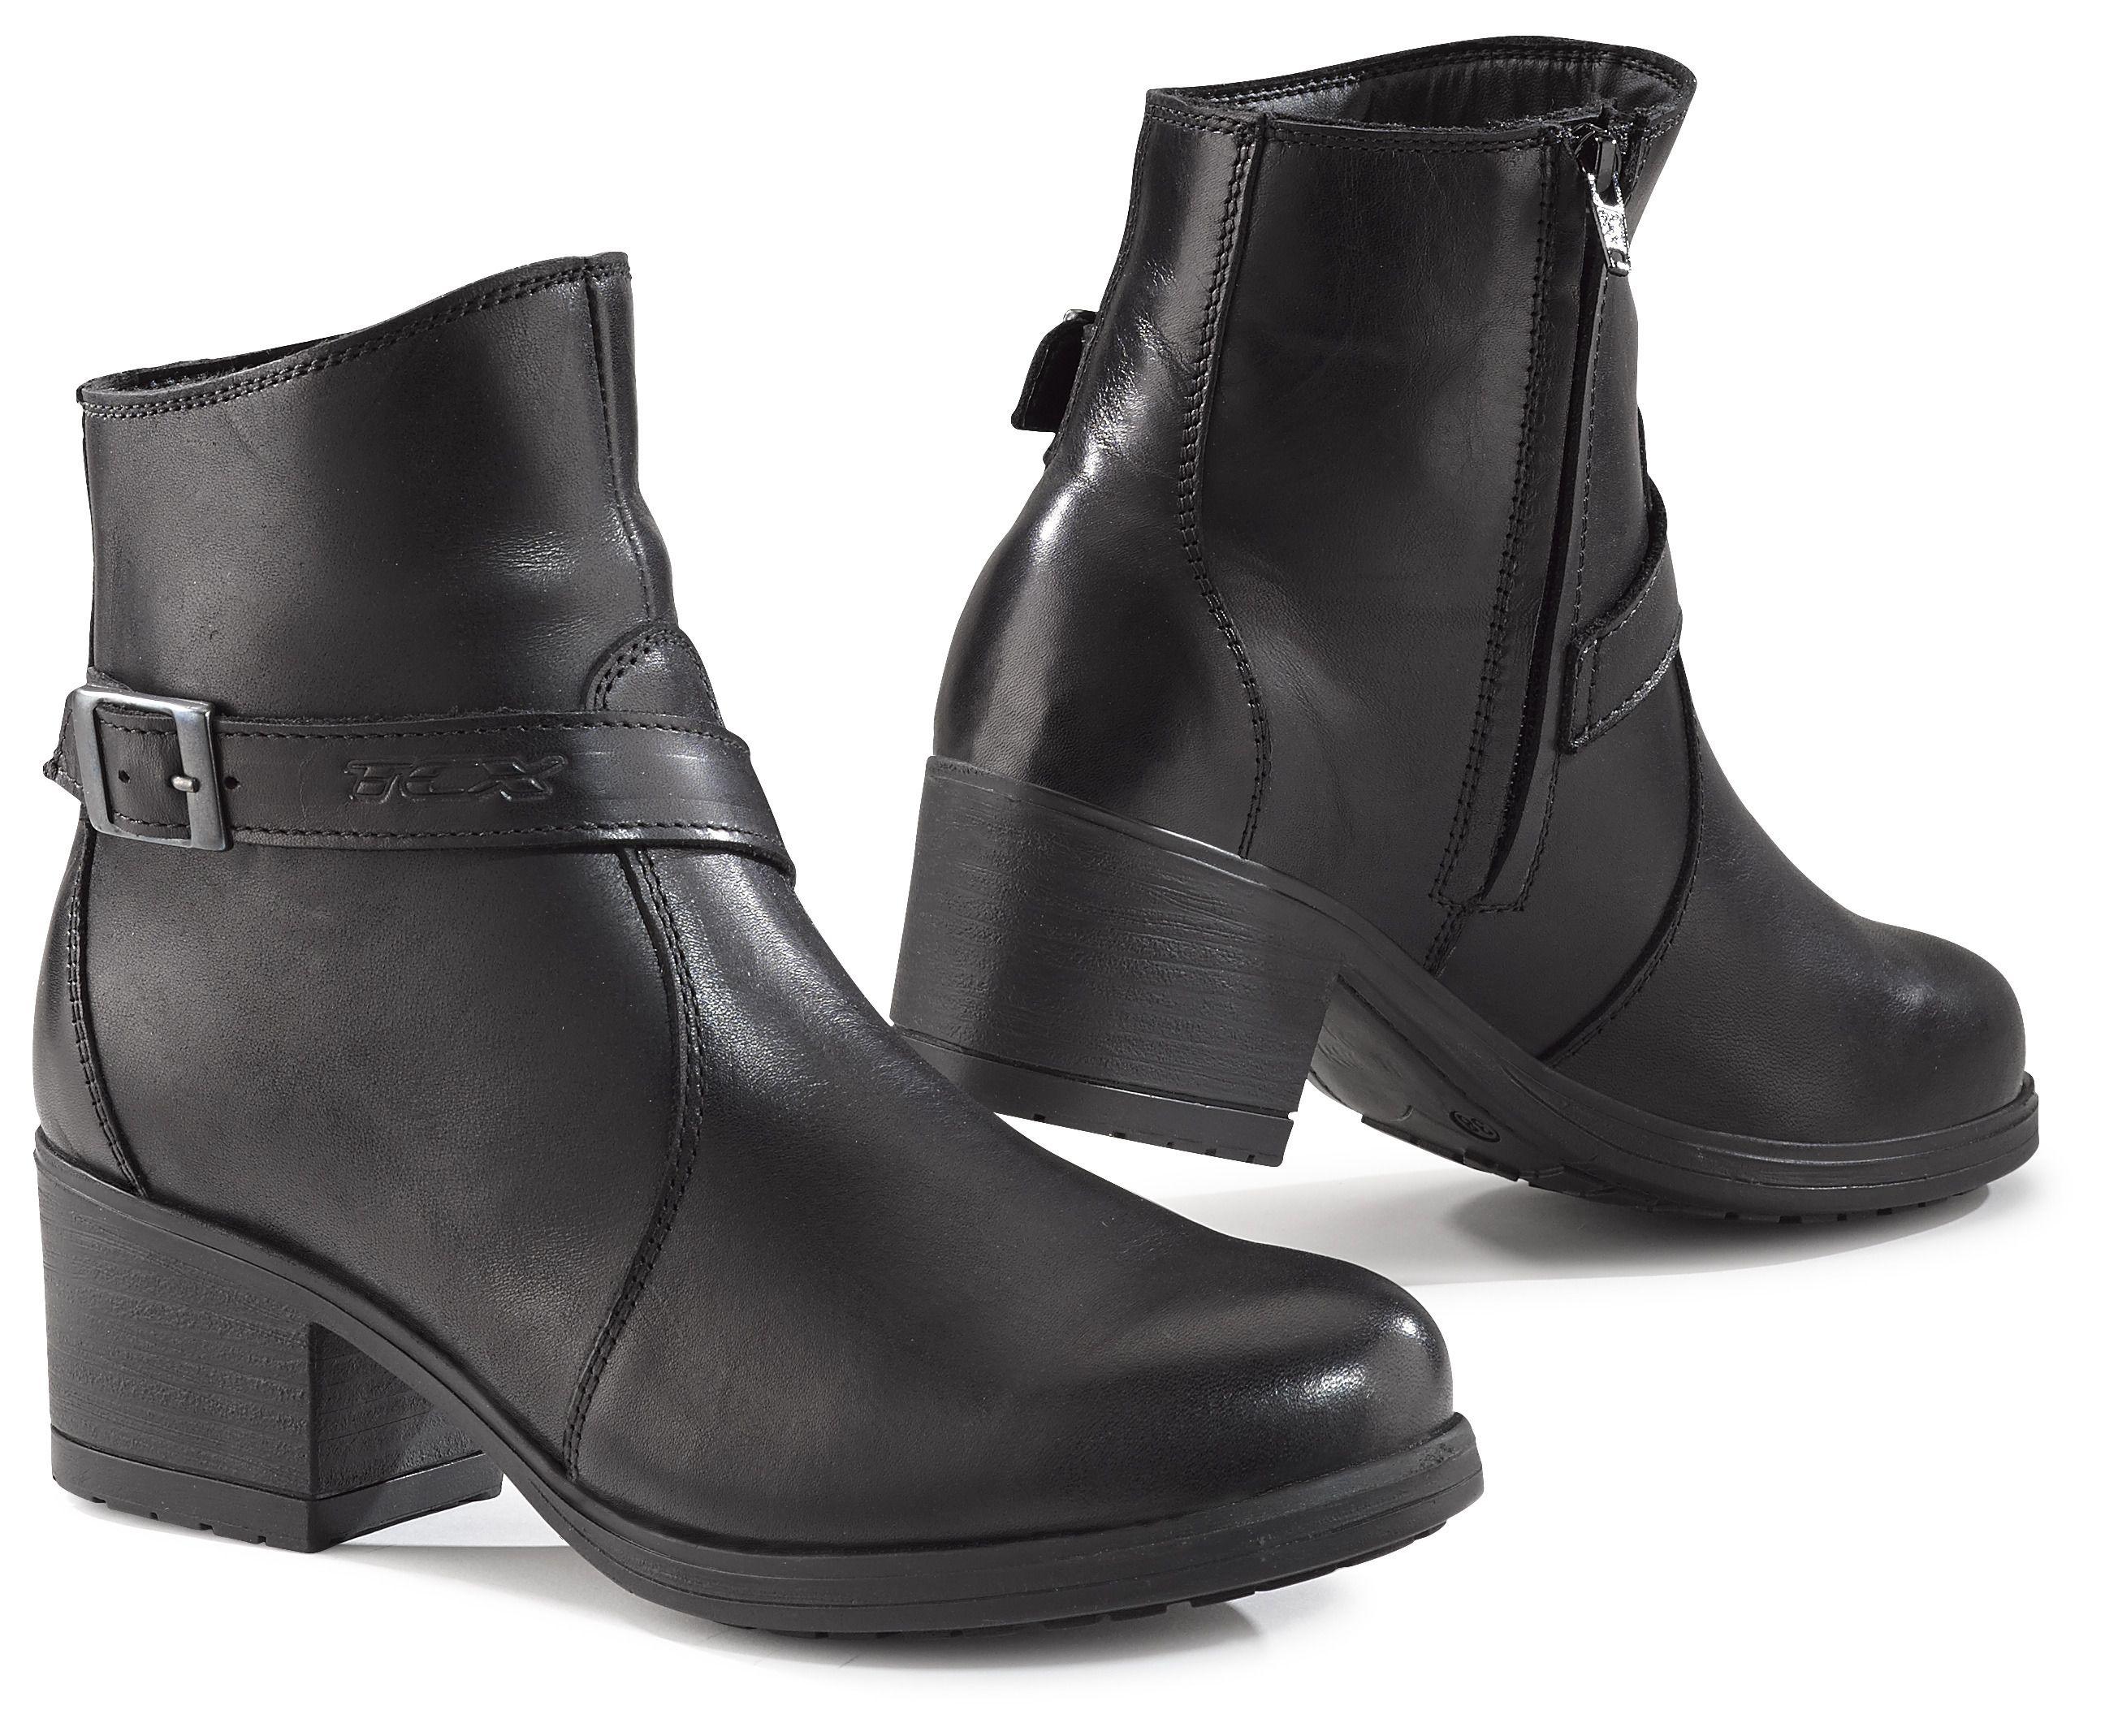 tcx x boulevard waterproof women 39 s boots revzilla. Black Bedroom Furniture Sets. Home Design Ideas